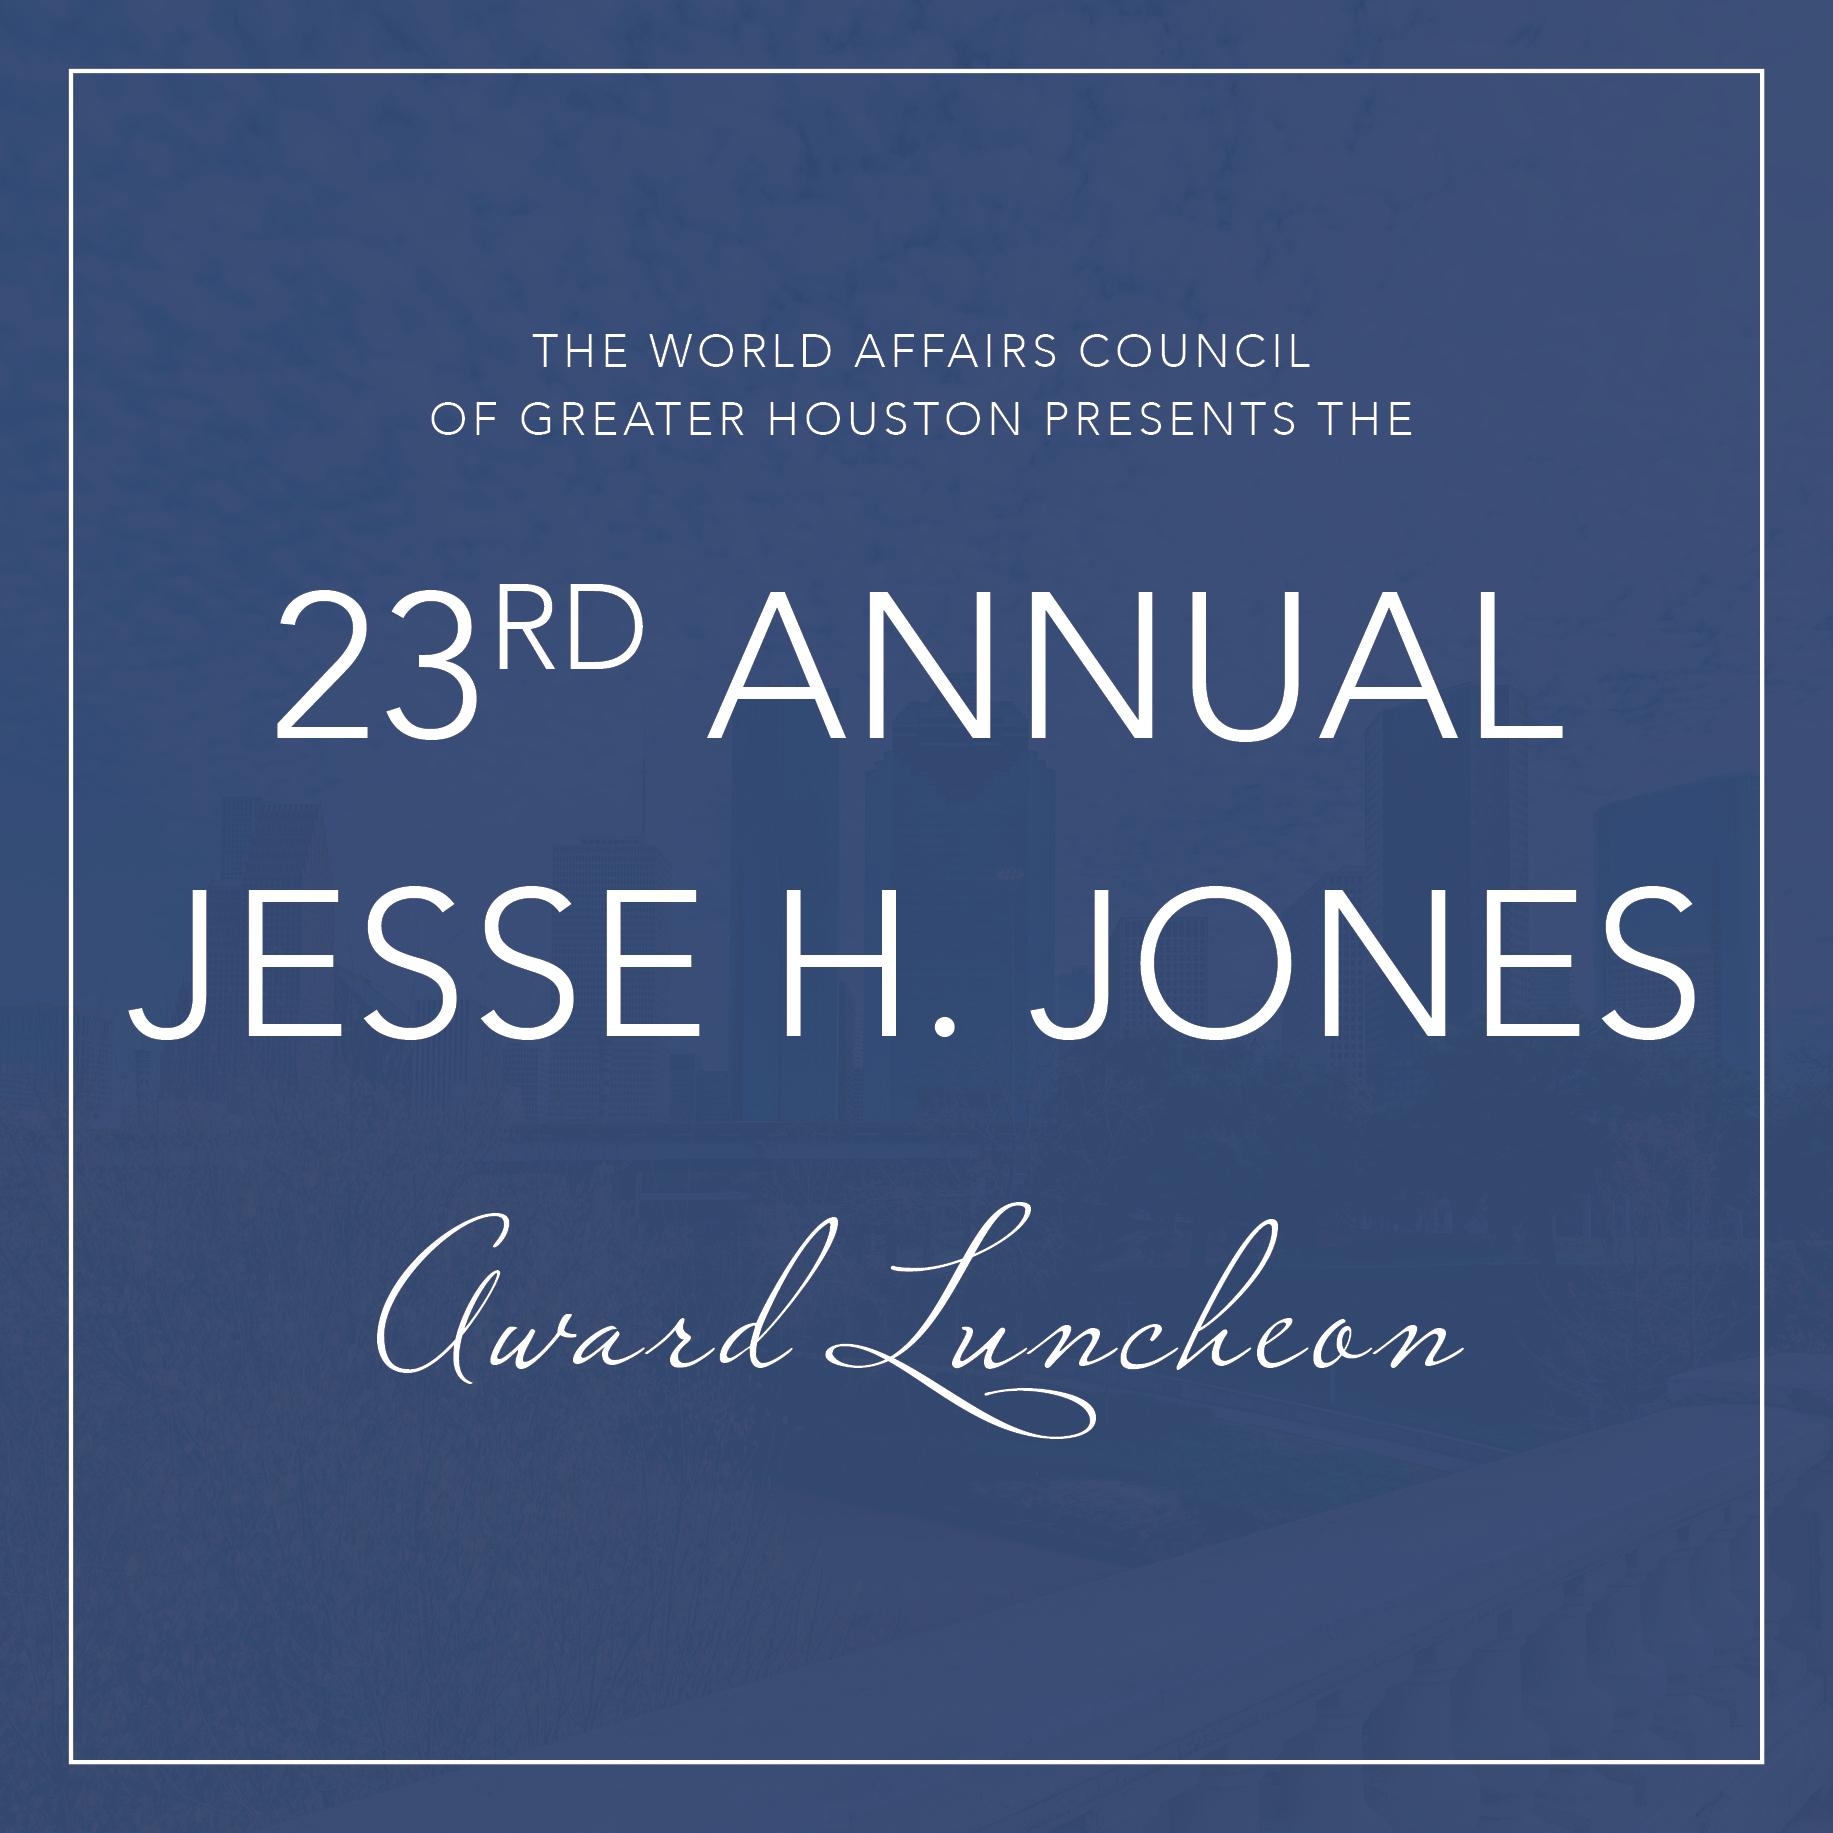 2021 Jesse H. Jones Award Luncheon Logo